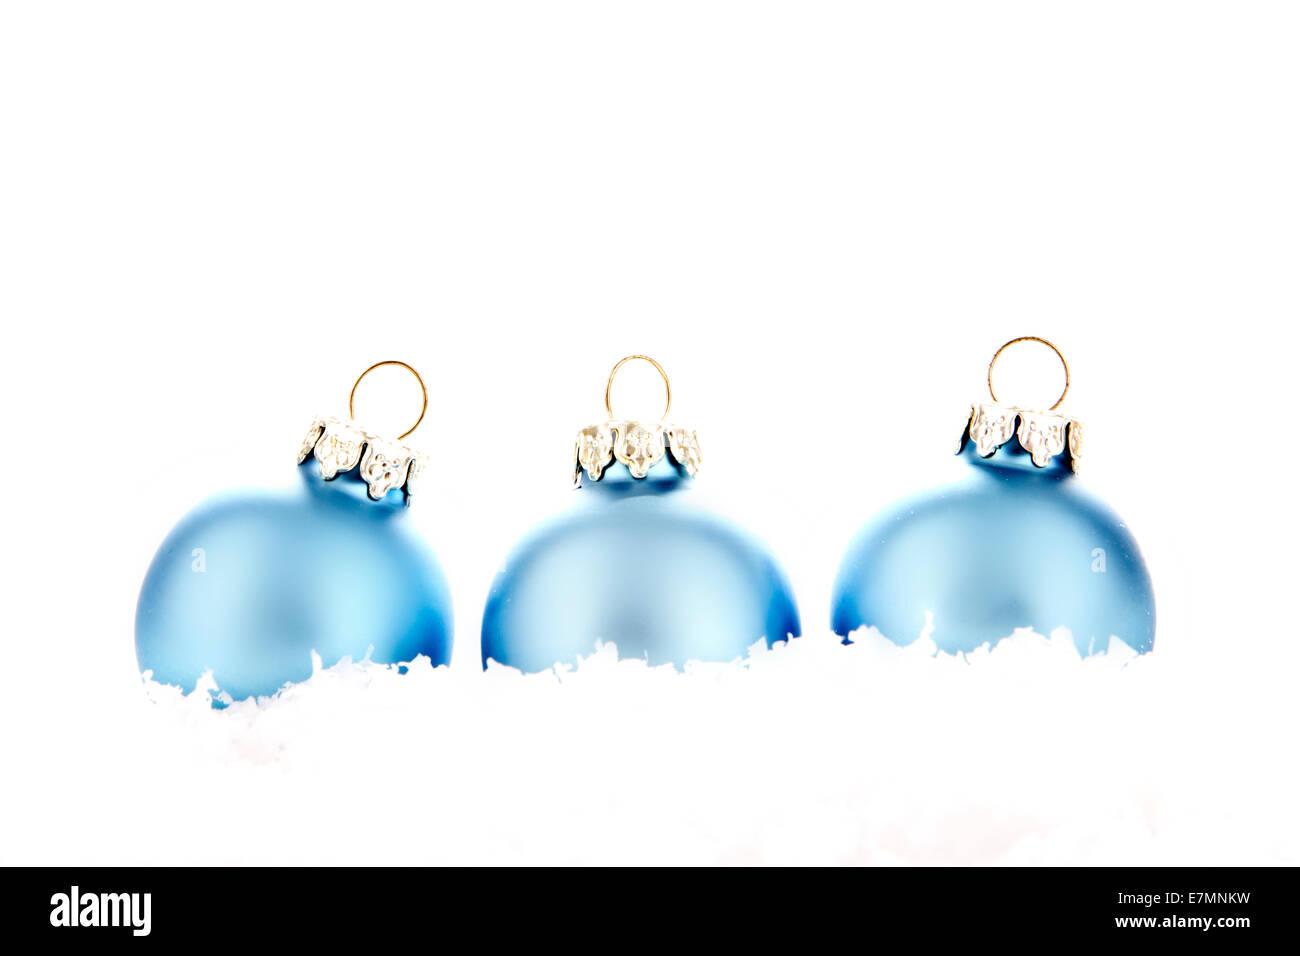 Colorful blue christmas baubles balls stockfotos - Weihnachtsdeko blau ...